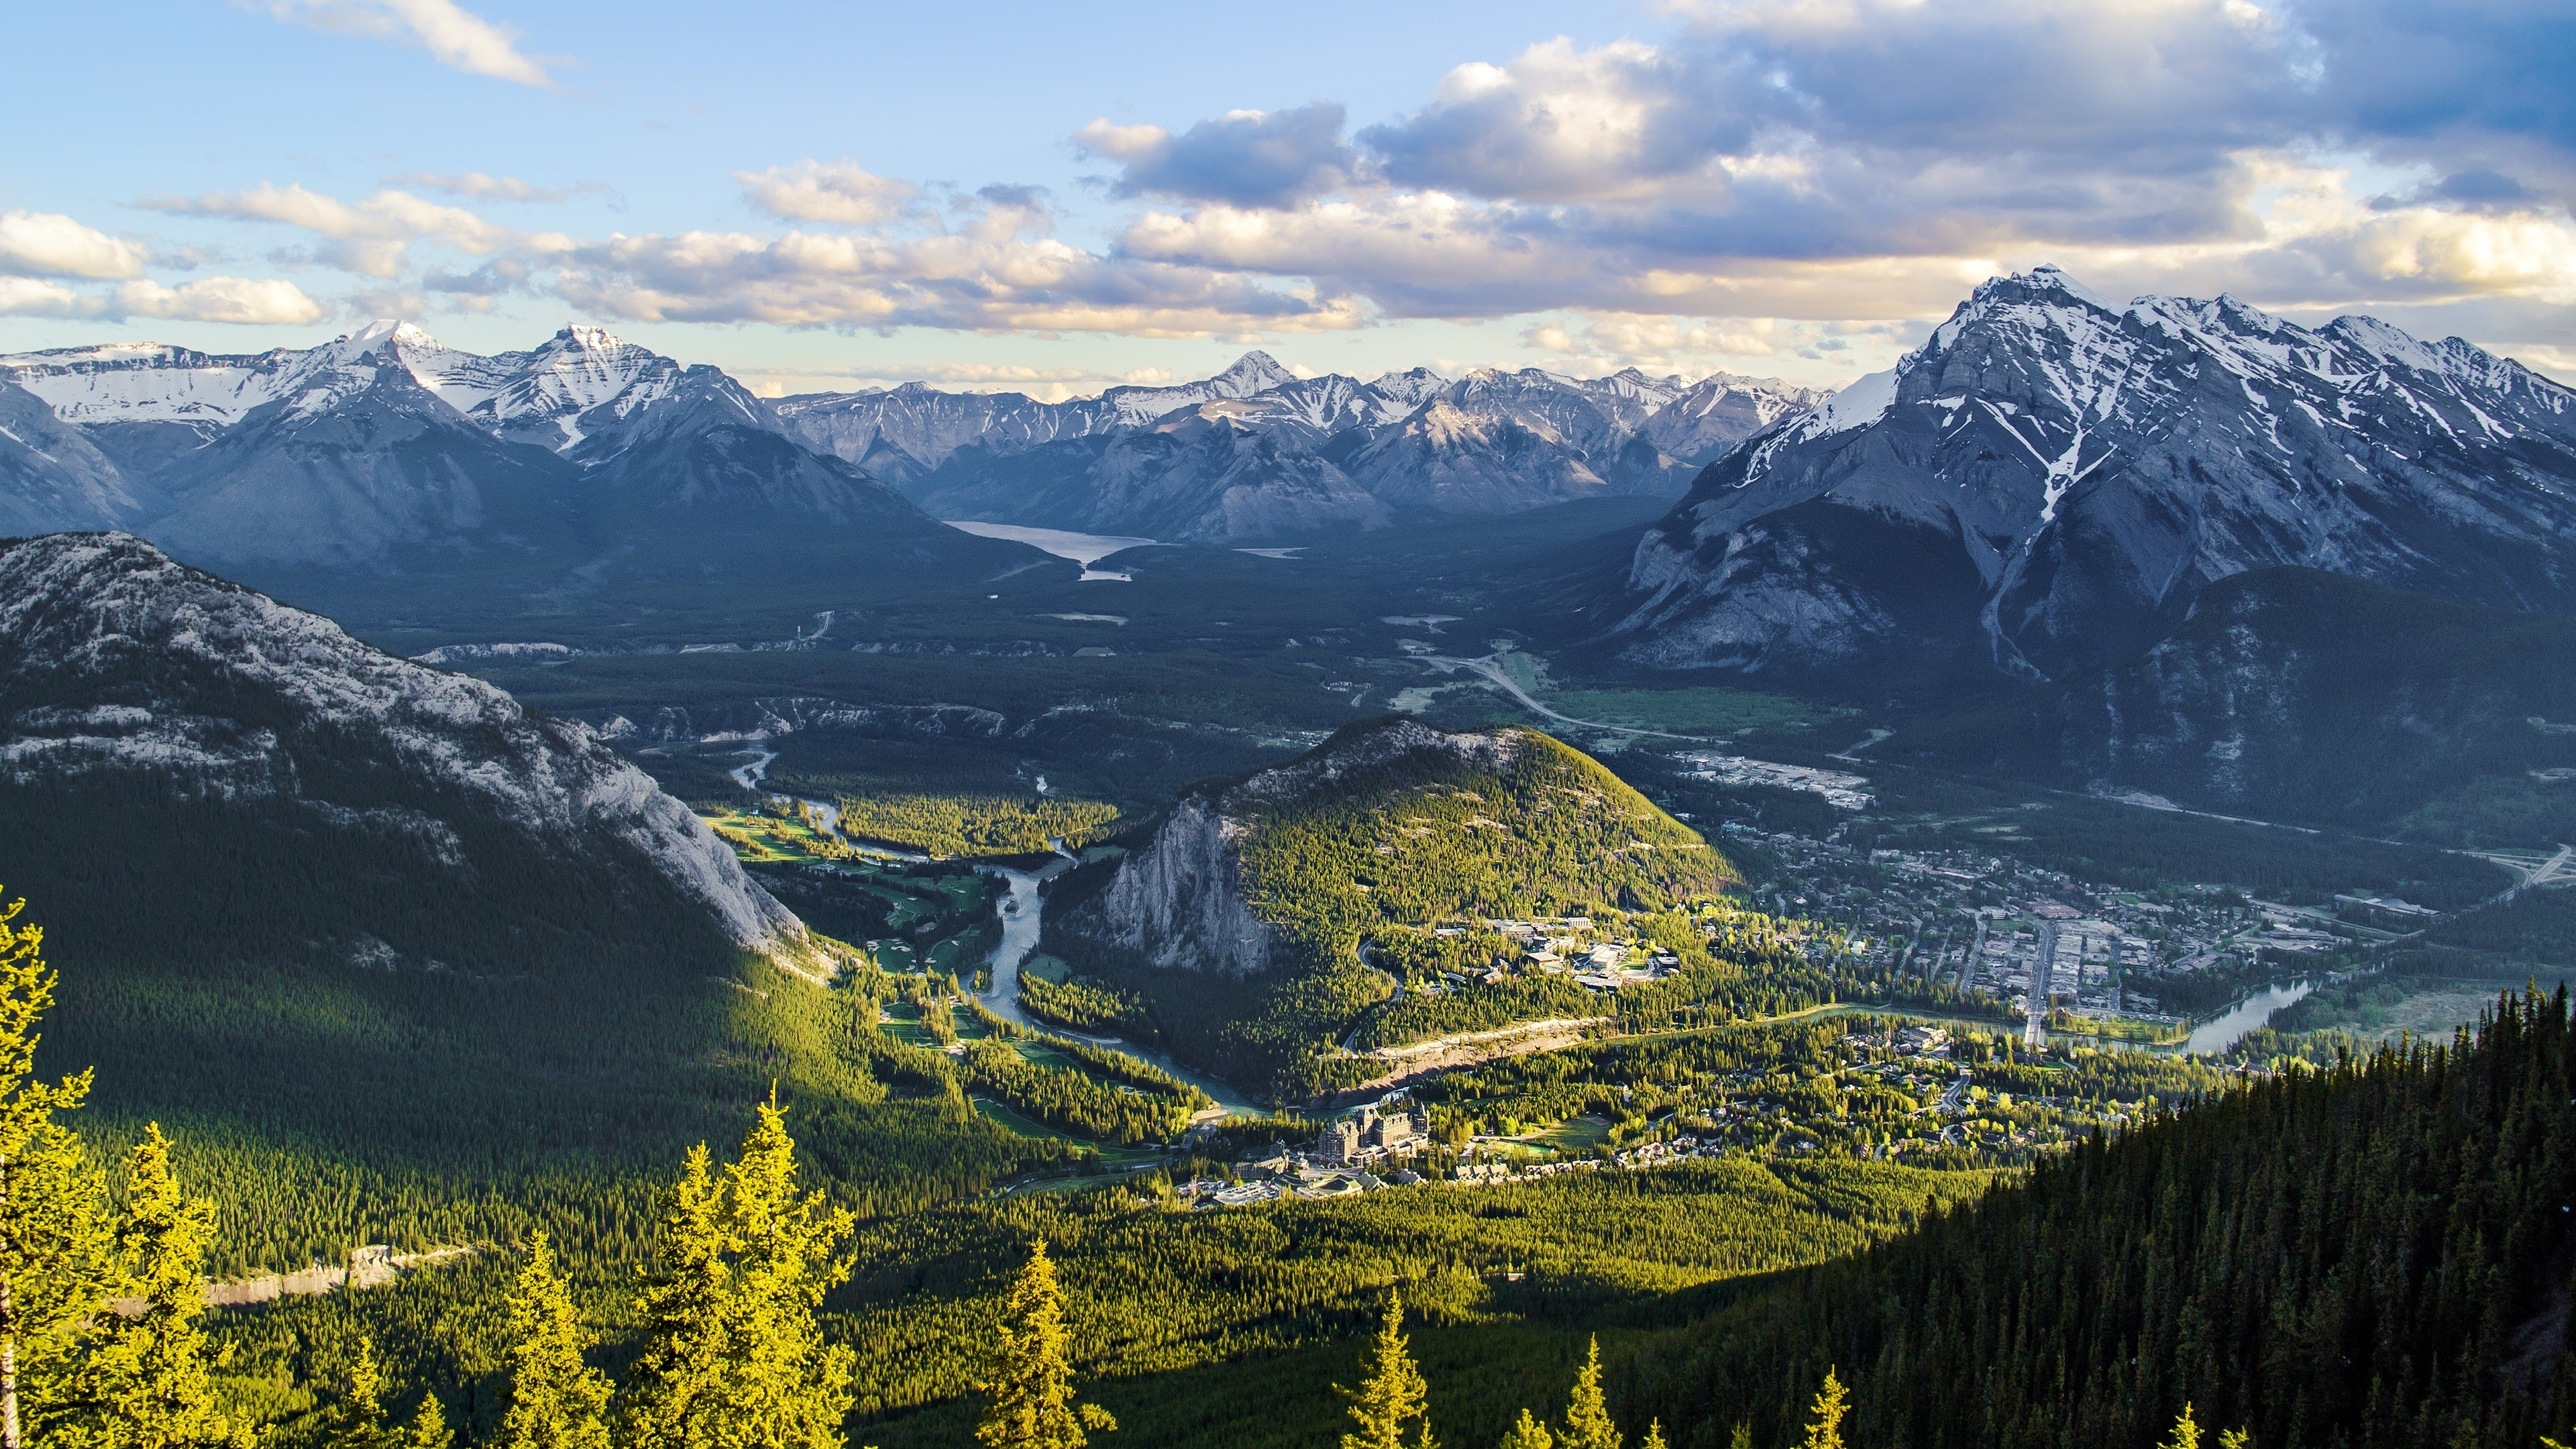 Landscape Banff Banff National Park Wallpaper And Background - Landscape Oil Painting On Canvas , HD Wallpaper & Backgrounds